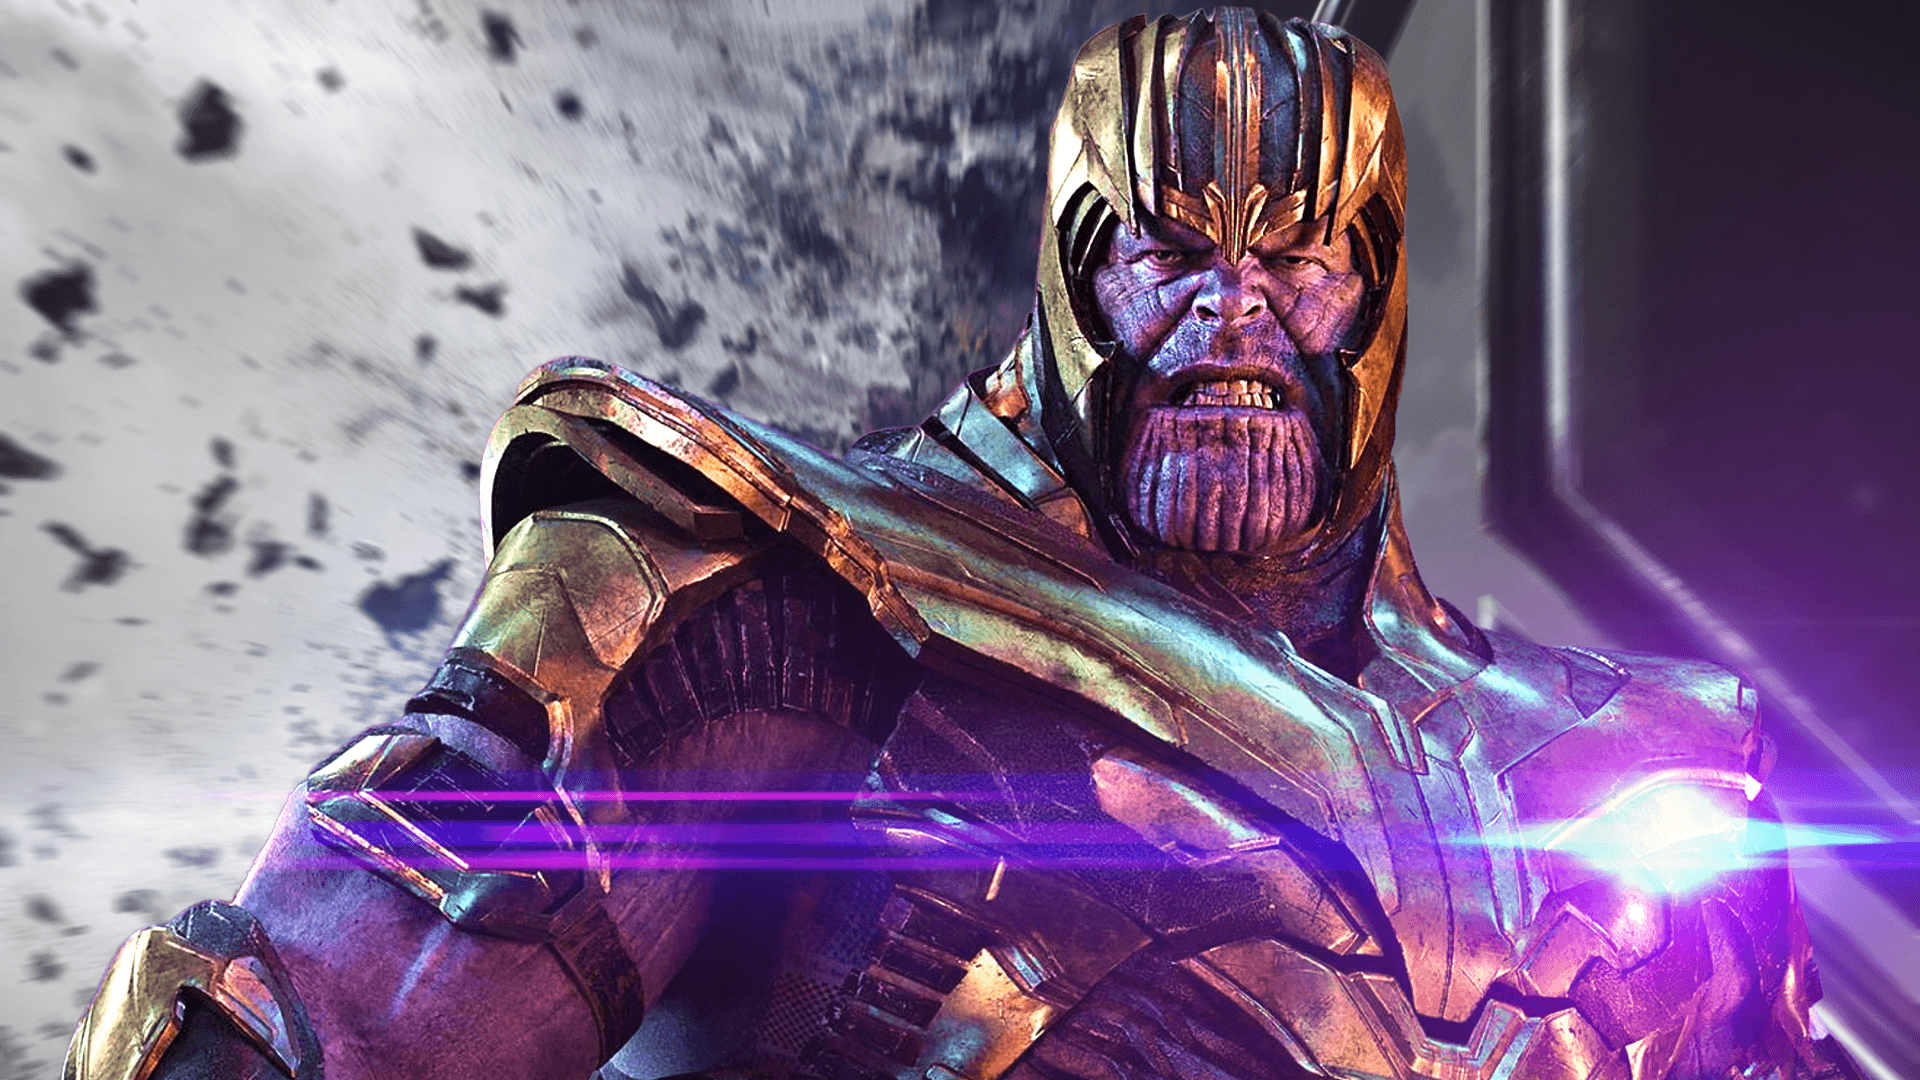 Zaujímavosti o Avengers: Endgame